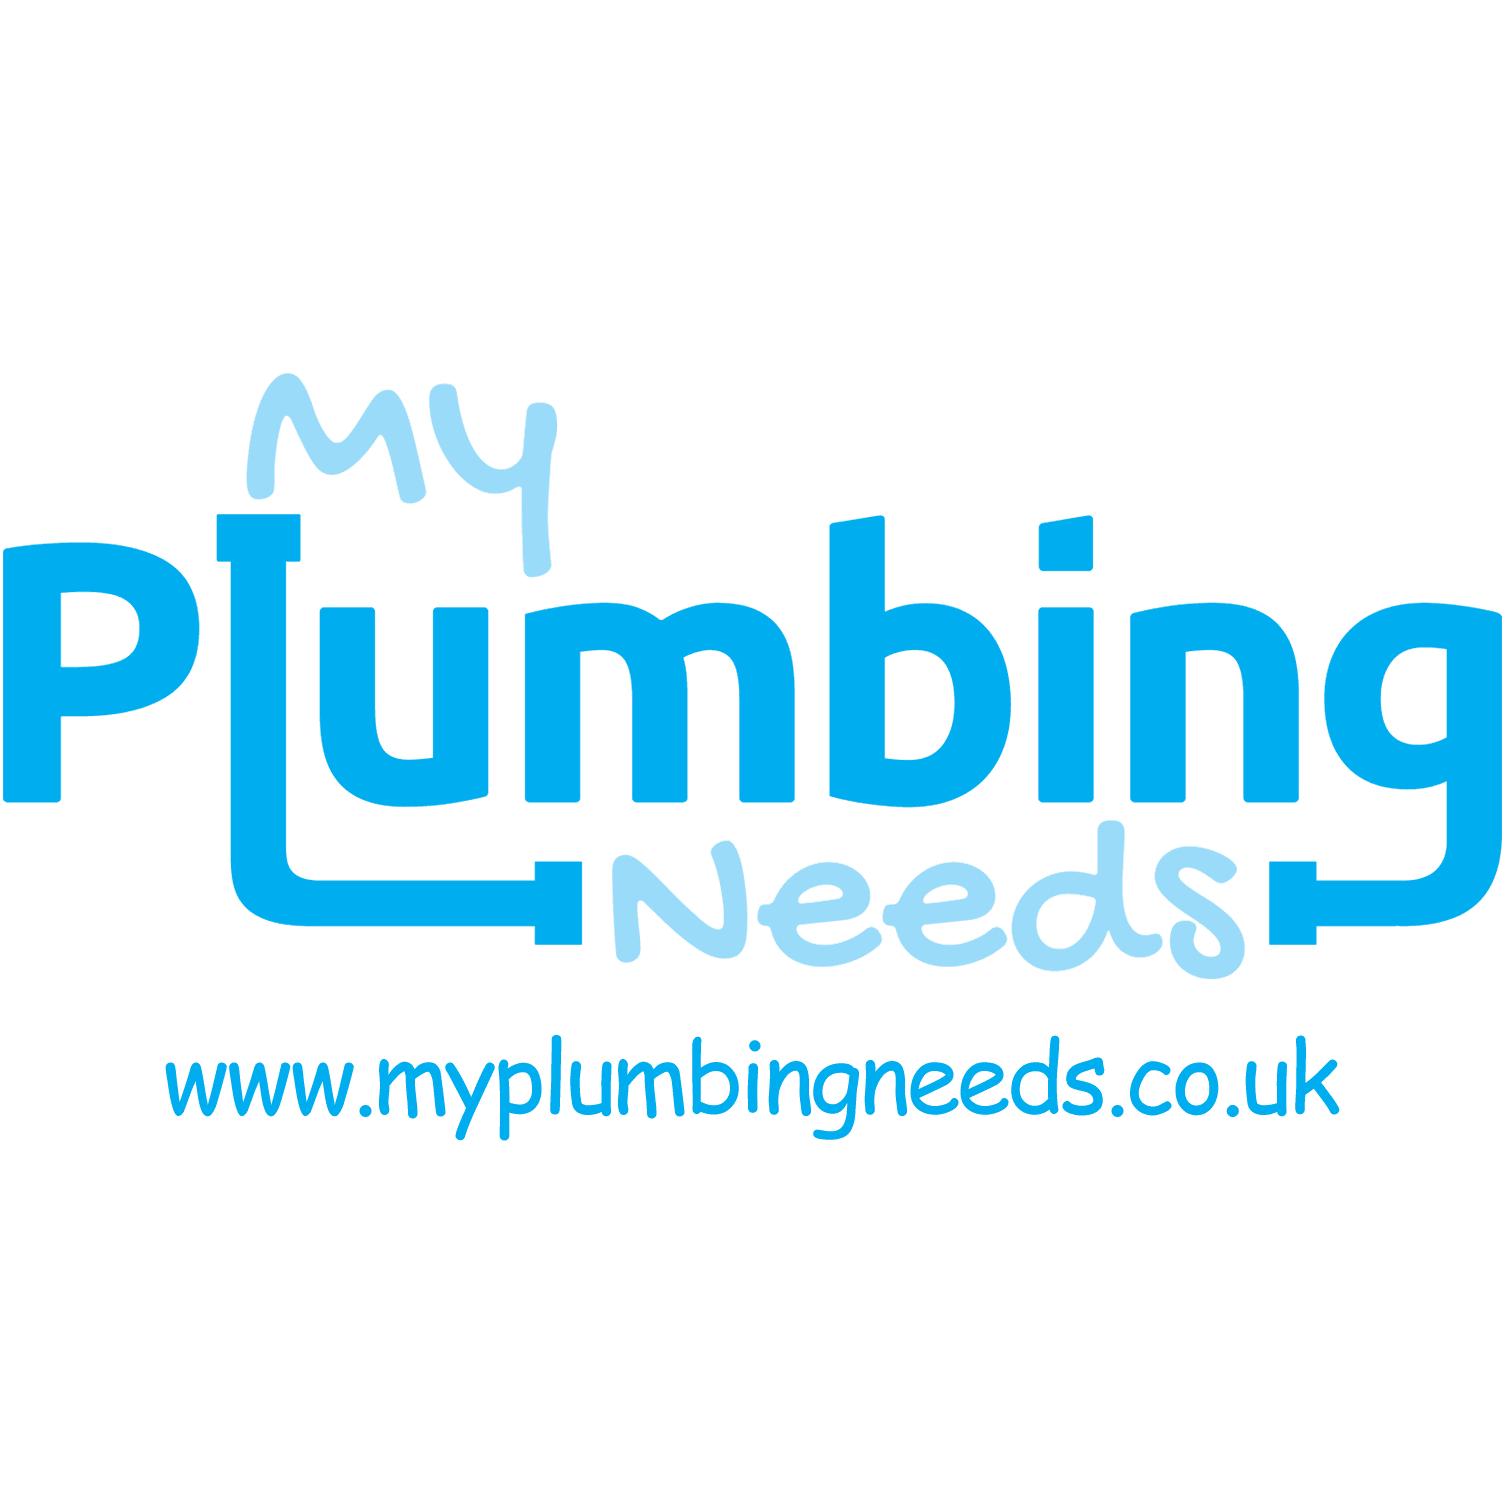 My Plumbing Needs - Northampton, Northamptonshire NN1 5AJ - 07711 286442 | ShowMeLocal.com